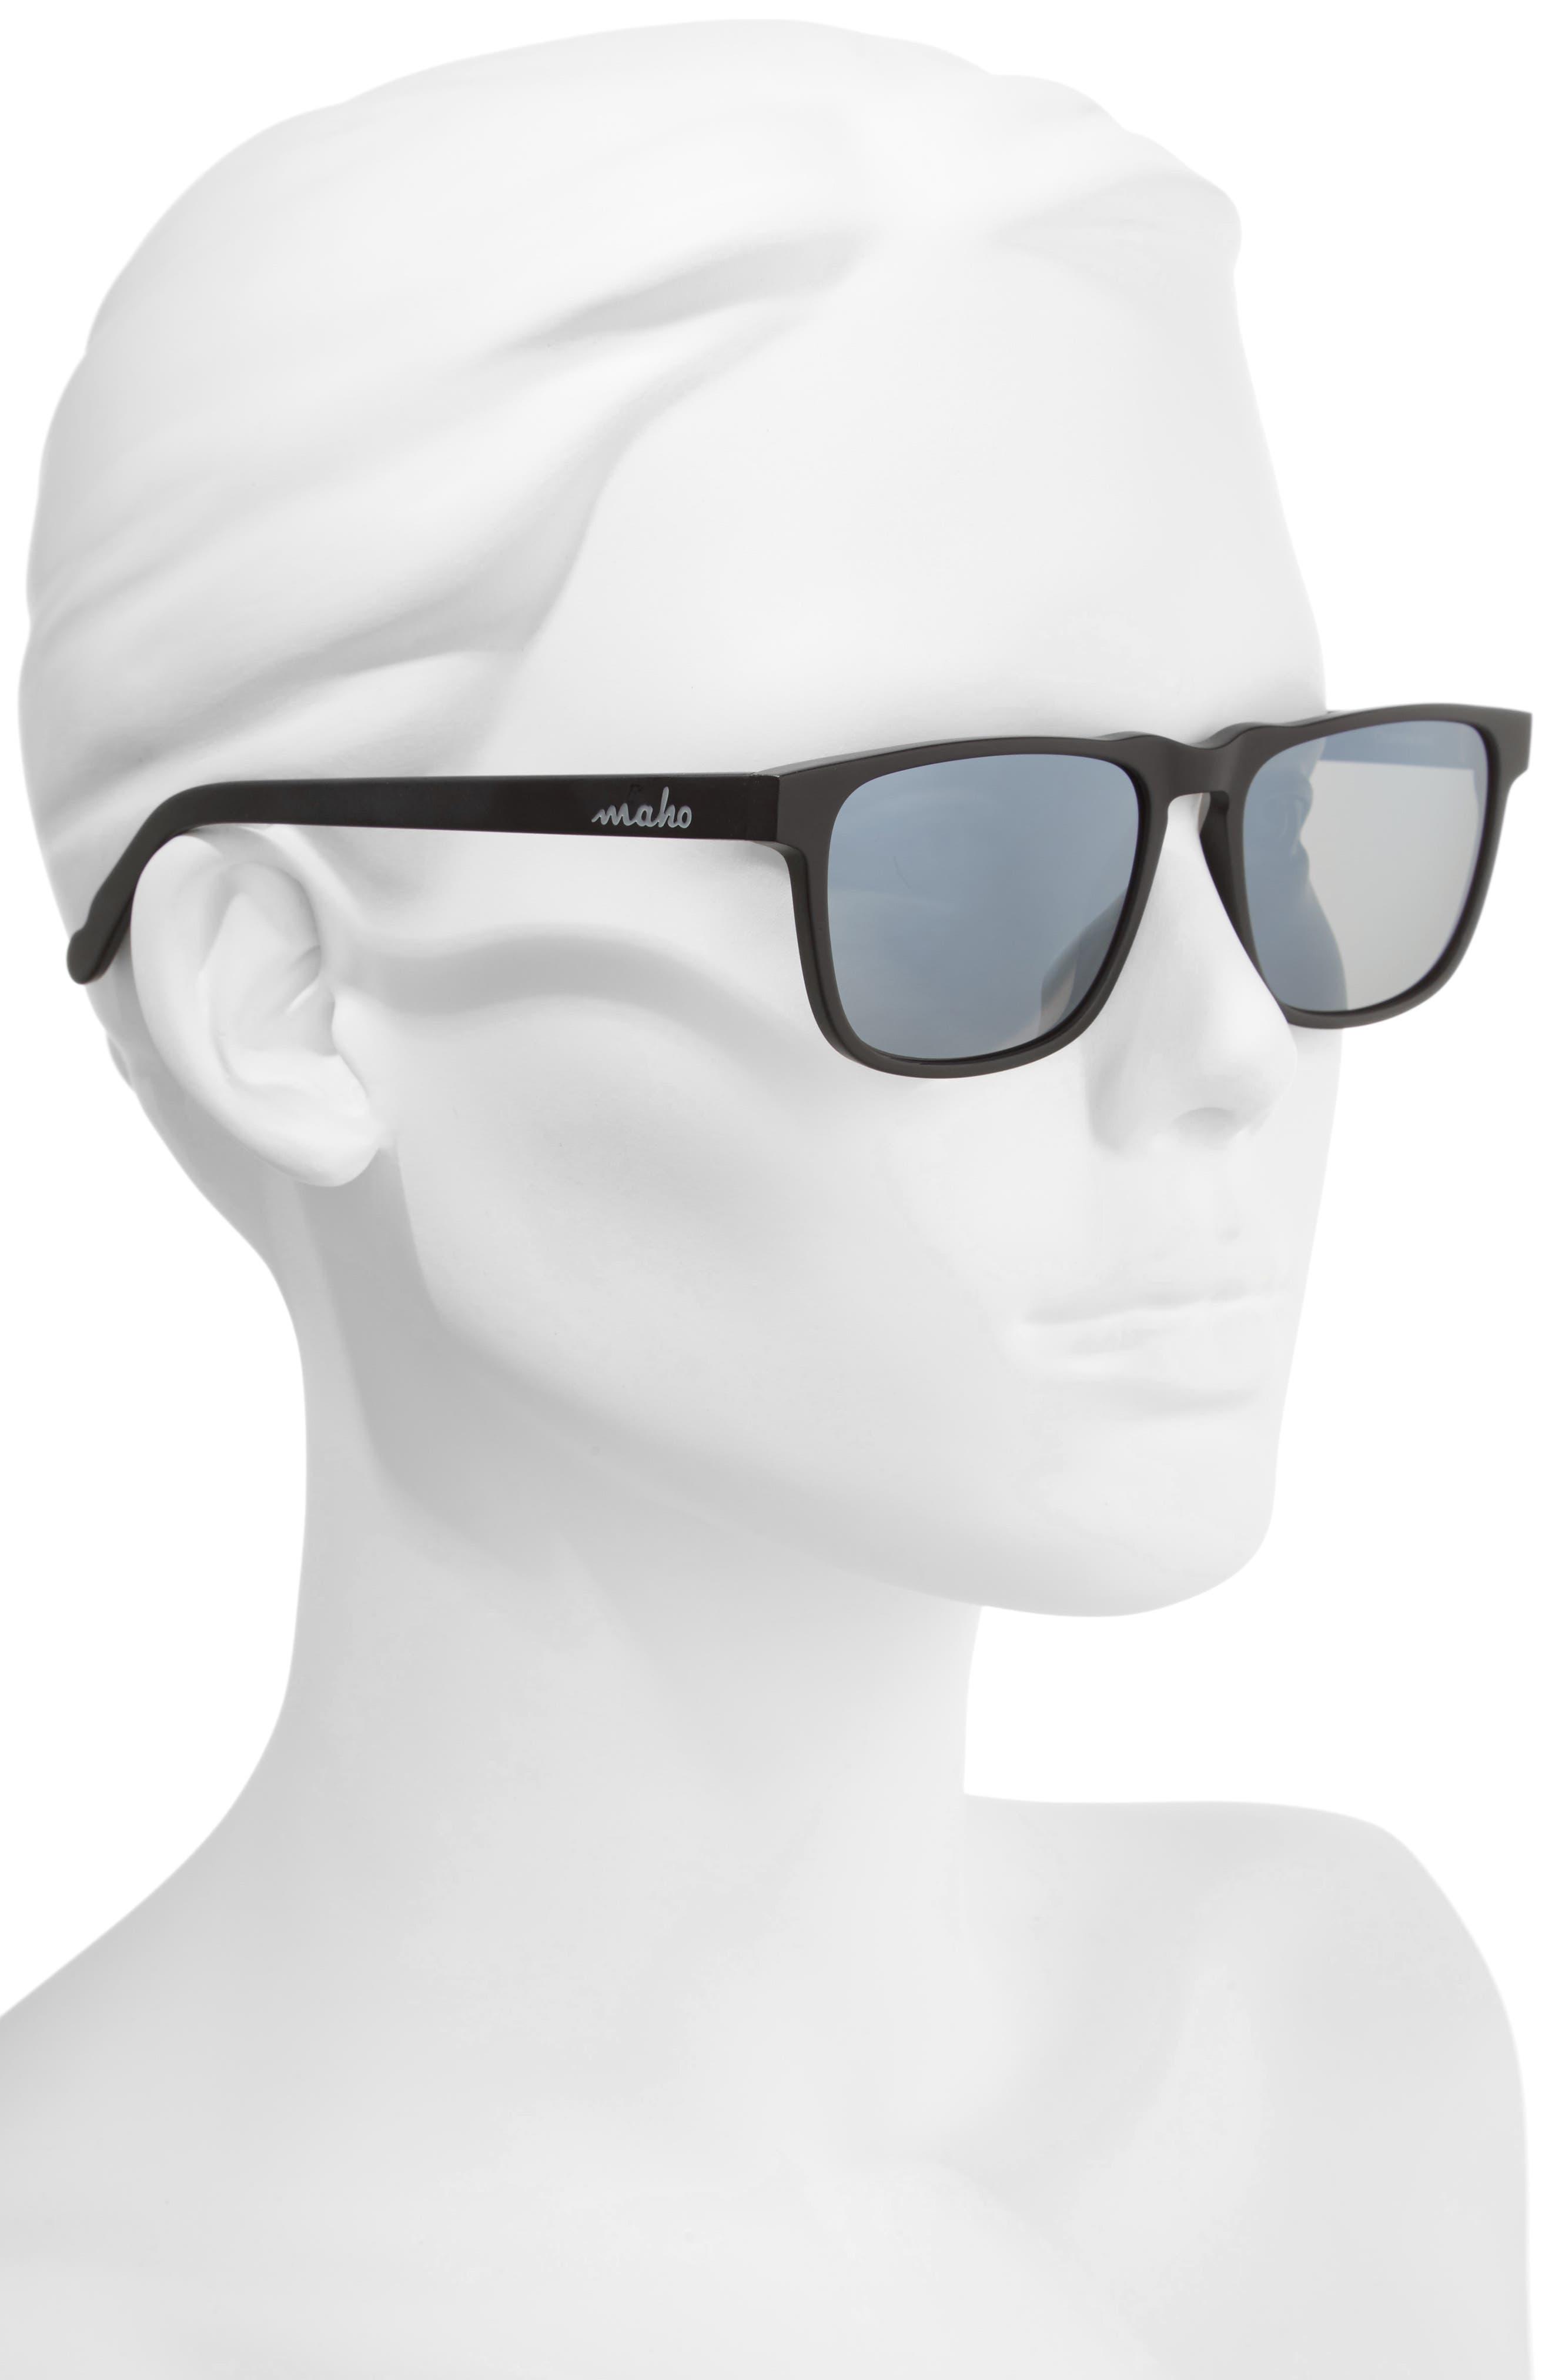 Chandeleur 59mm Polarized Aviator Sunglasses,                             Alternate thumbnail 2, color,                             020